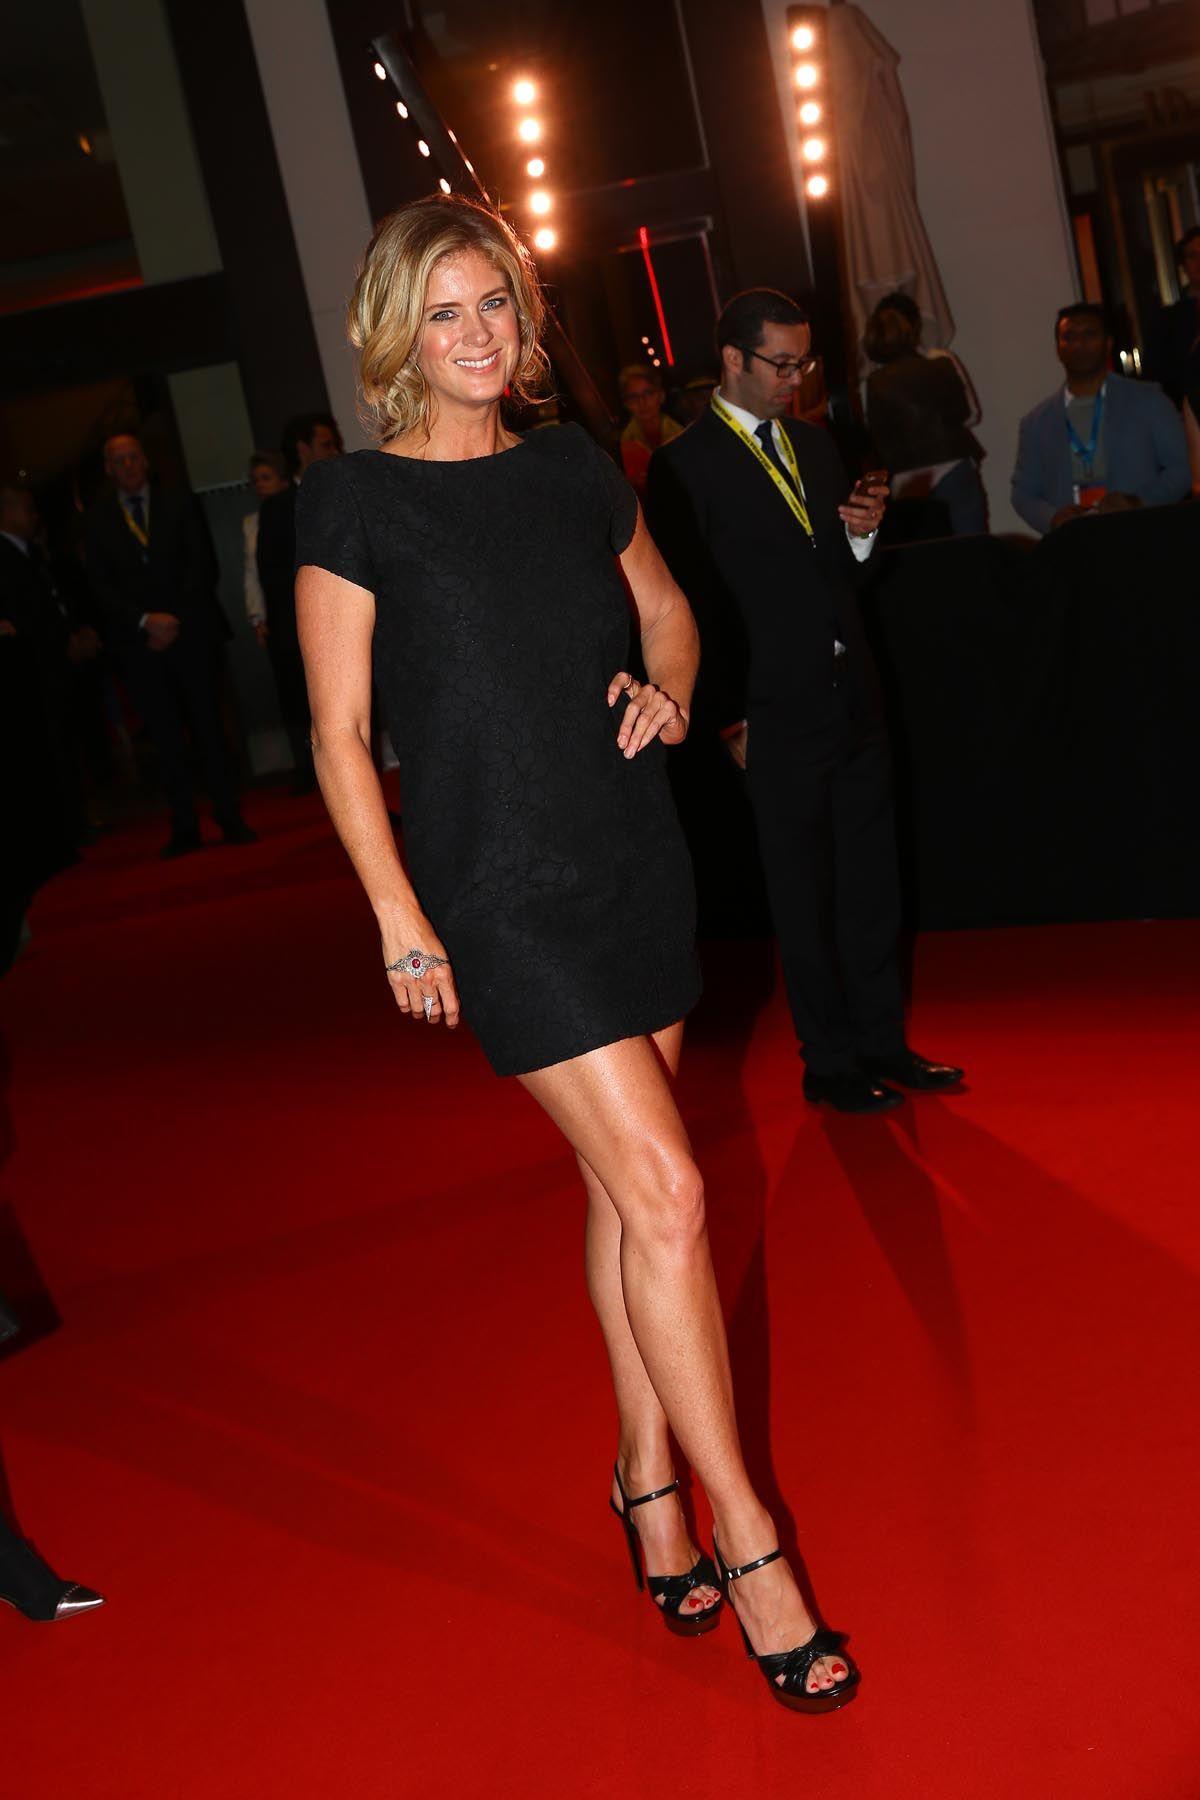 Rods ex Rachel Hunter shows she can still wear it well